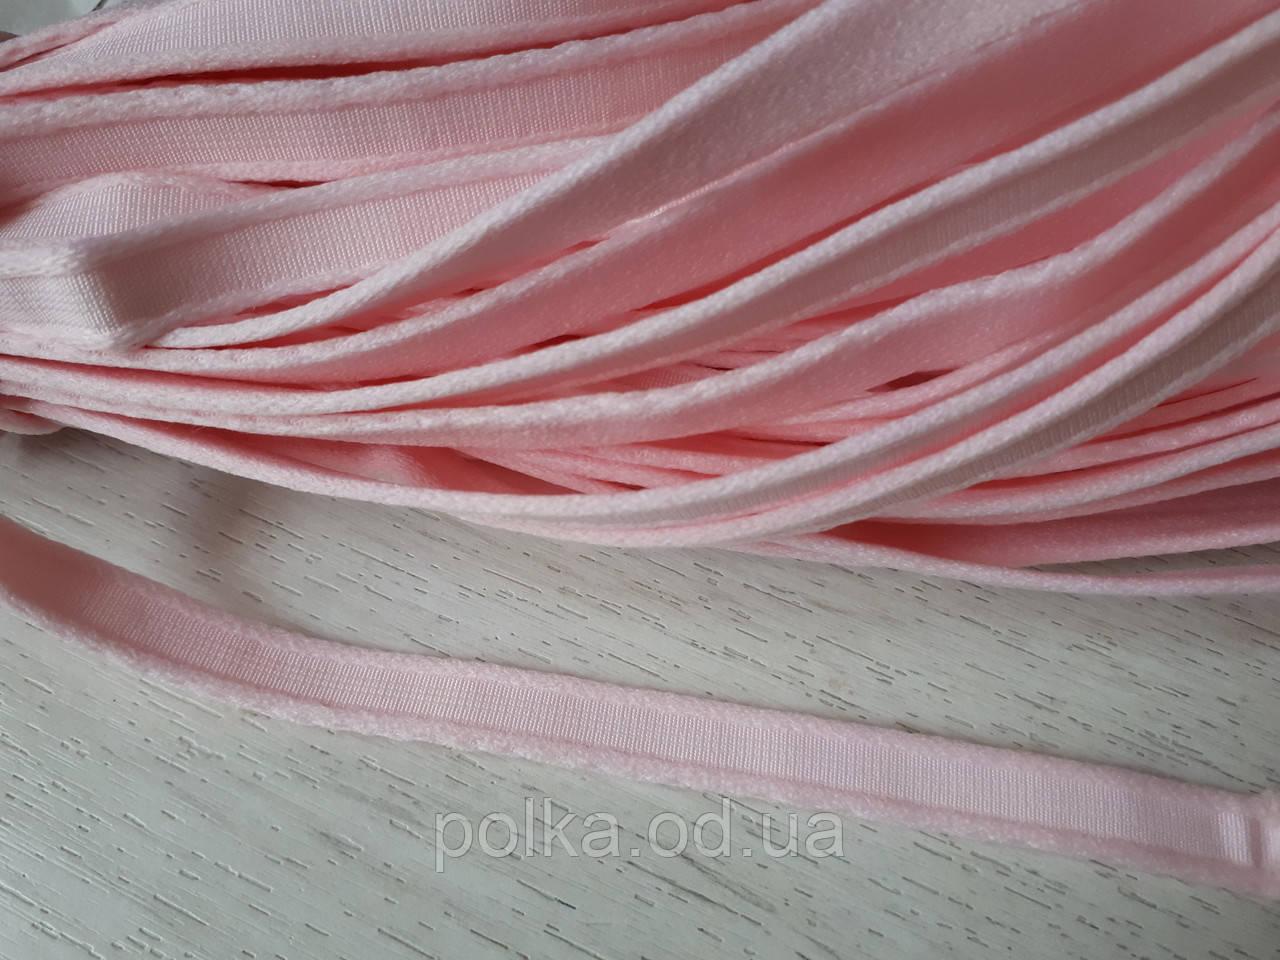 Туннельная лента розовая плоская, ширина 1см, цвет розовый (Турция)